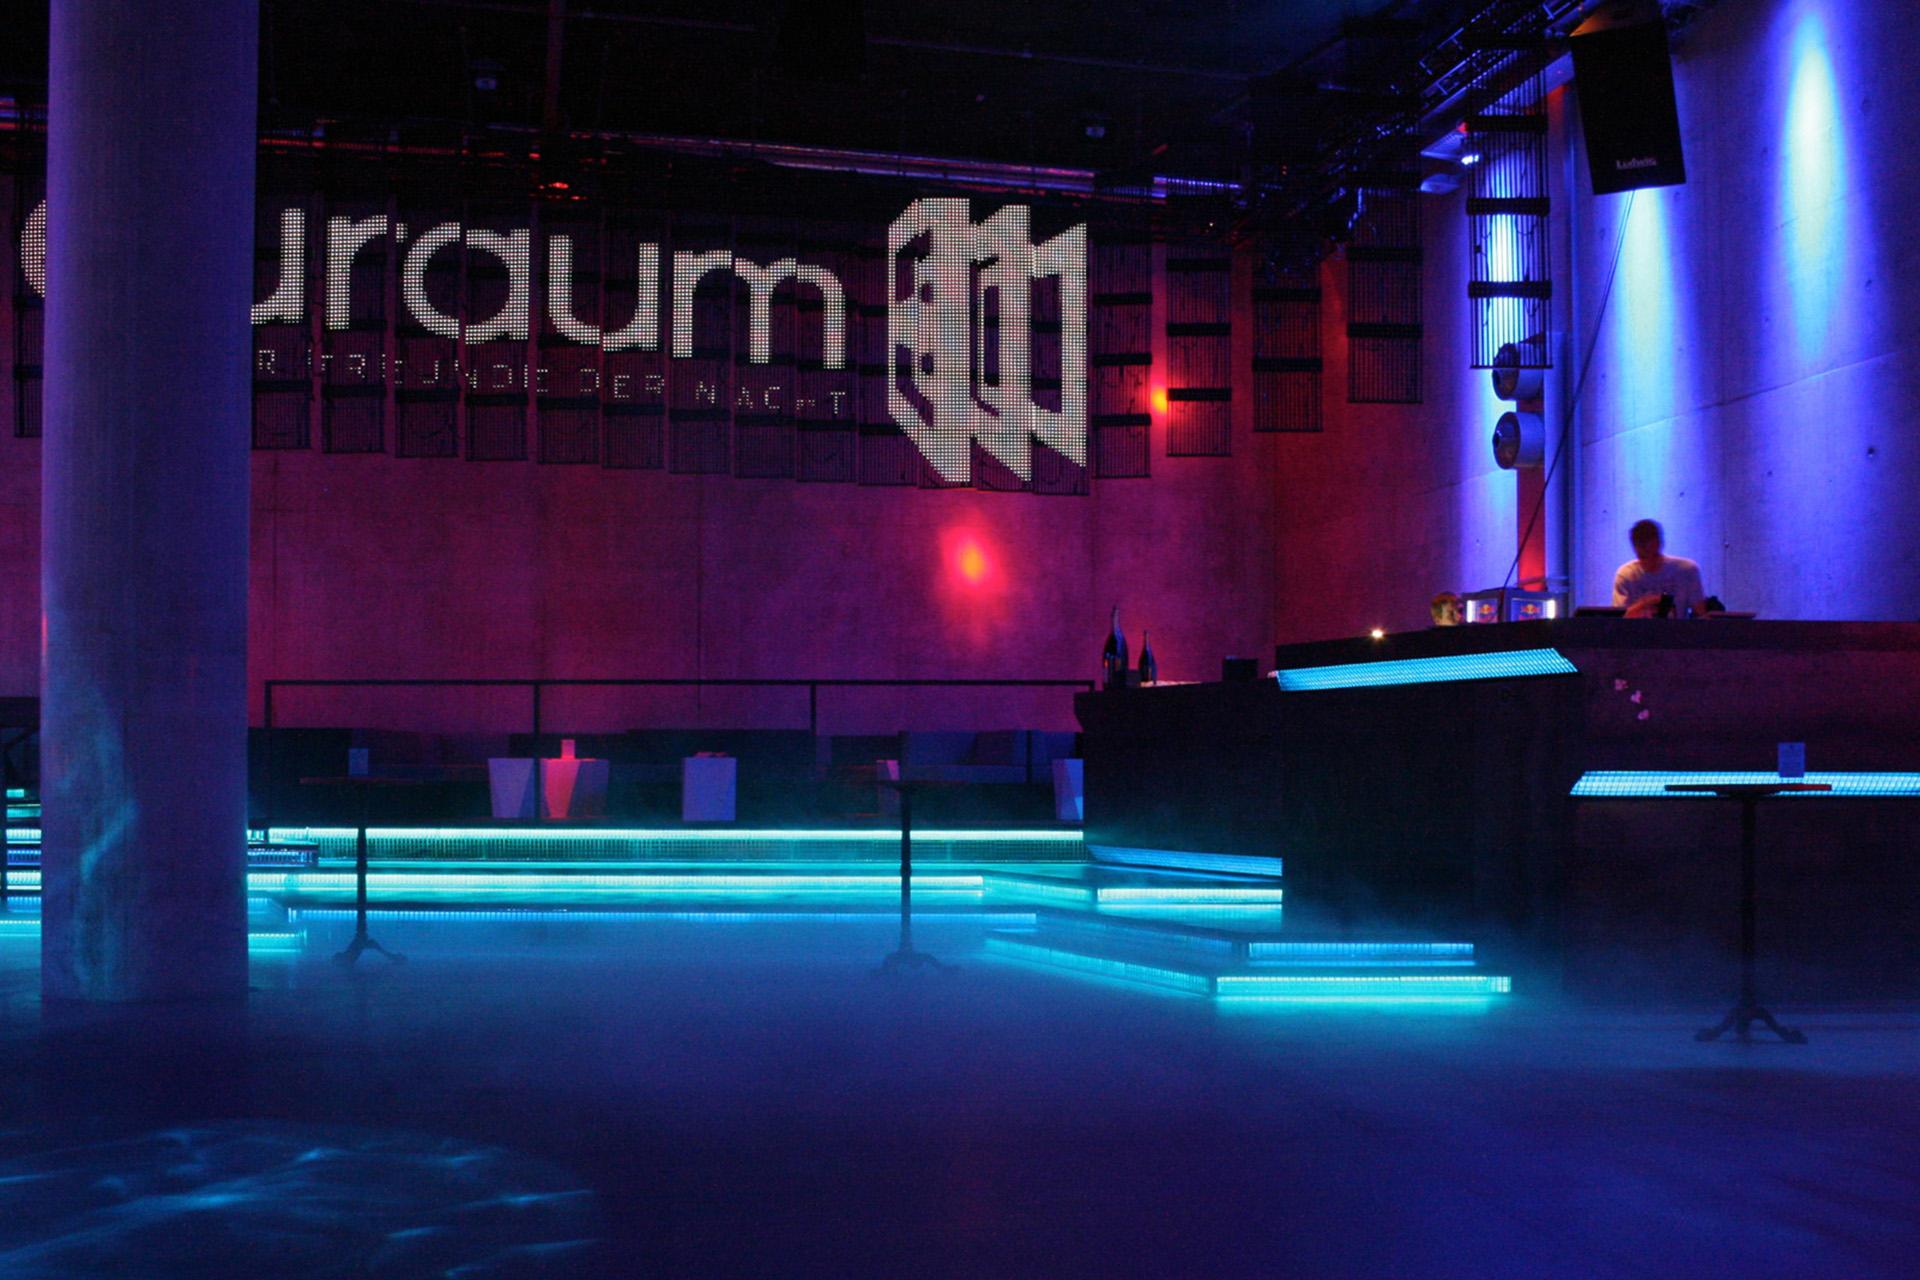 008-interior-design-hospitality-night-club-bar-neuraum-muenchen-buero-philipp-moeller.jpg